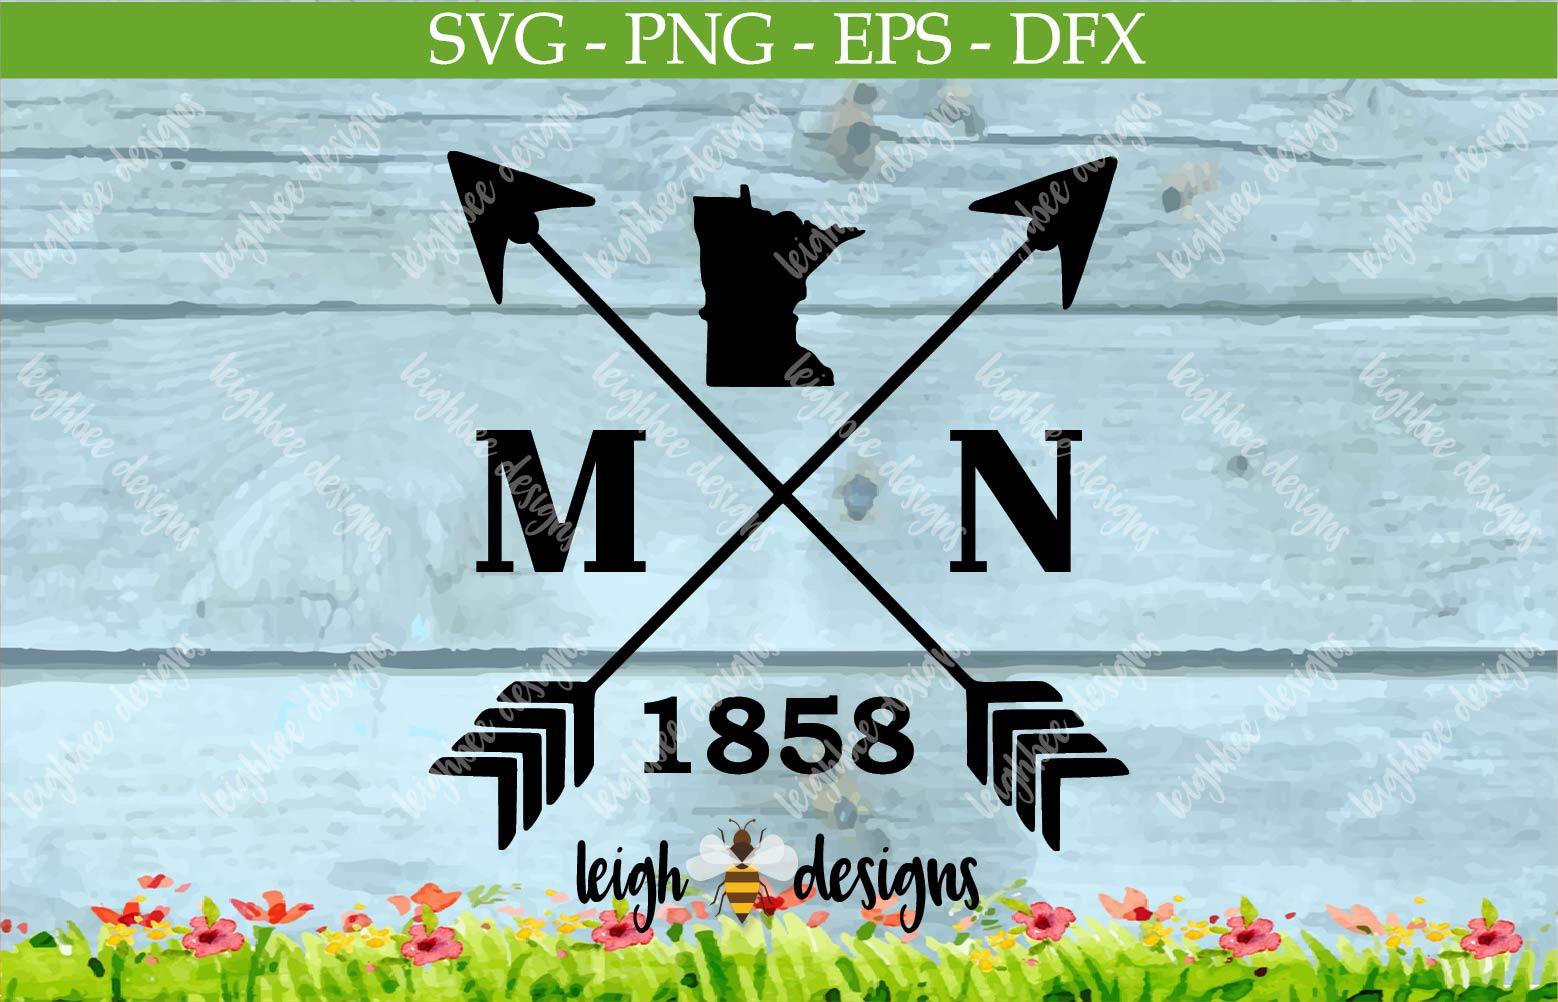 Arrow Minnesota 1858 example image 1